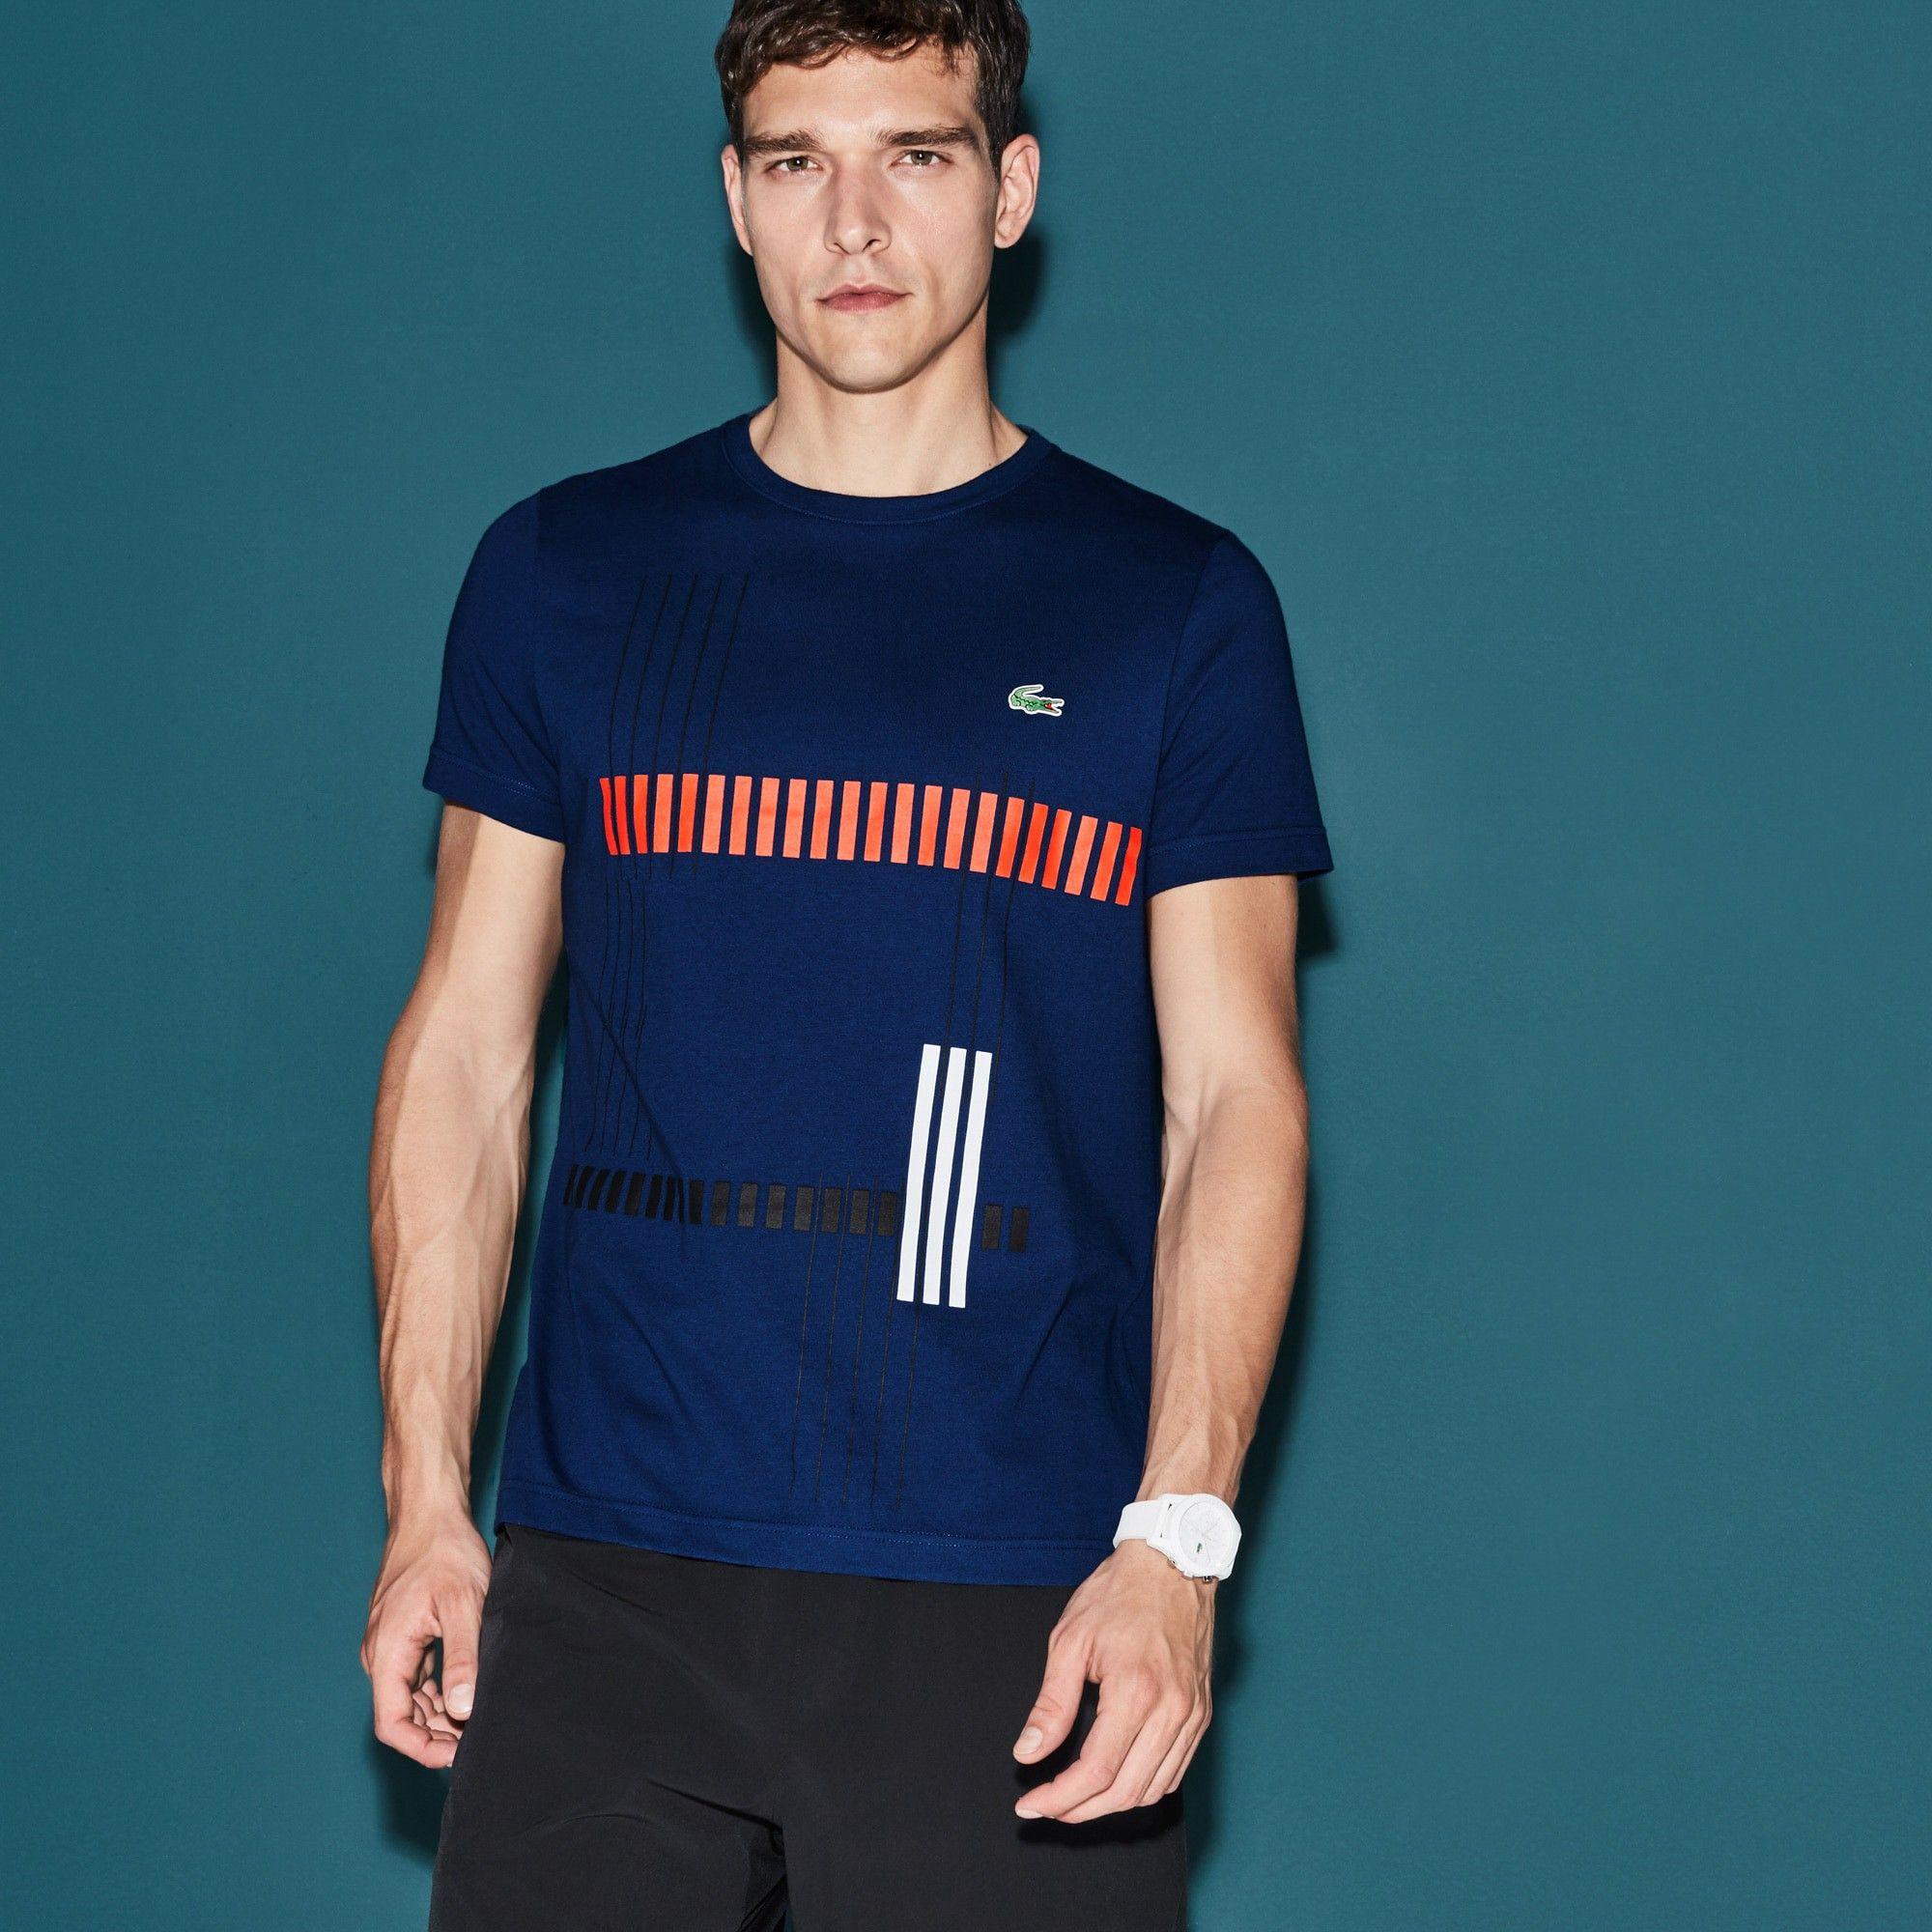 1c2e8639 LACOSTE Men's SPORT Tennis Striped Design Tech Jersey T ...